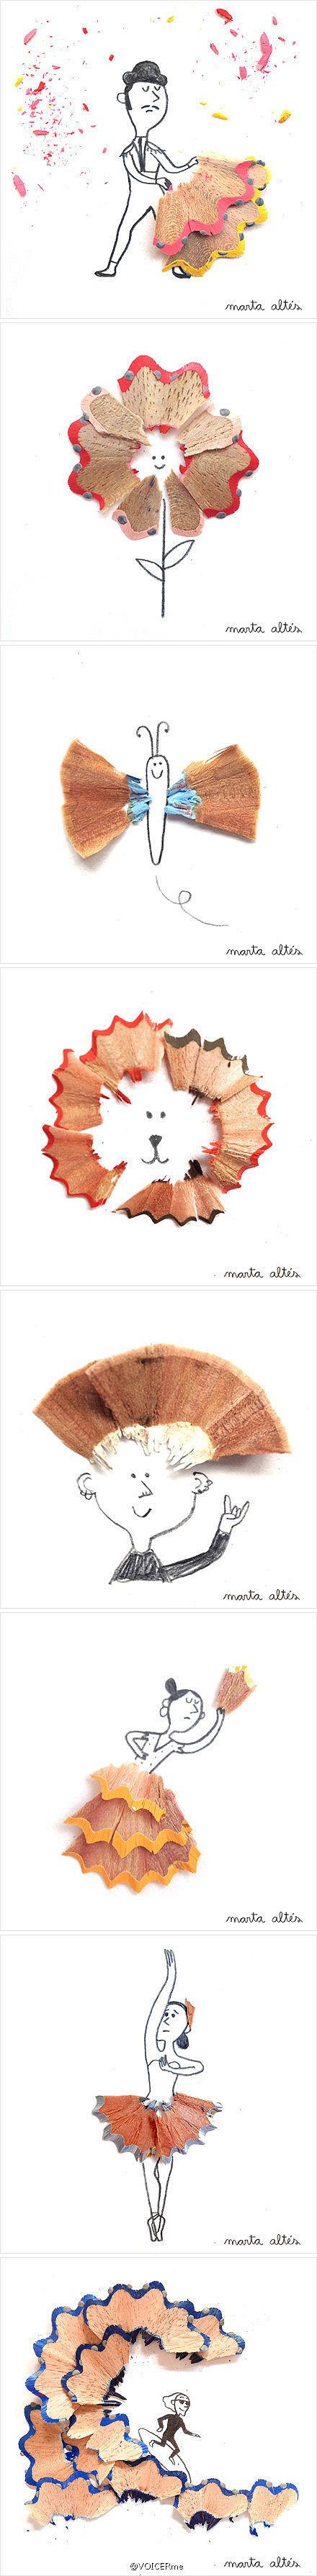 haha interesting way of incorporating pencil shavings with art!